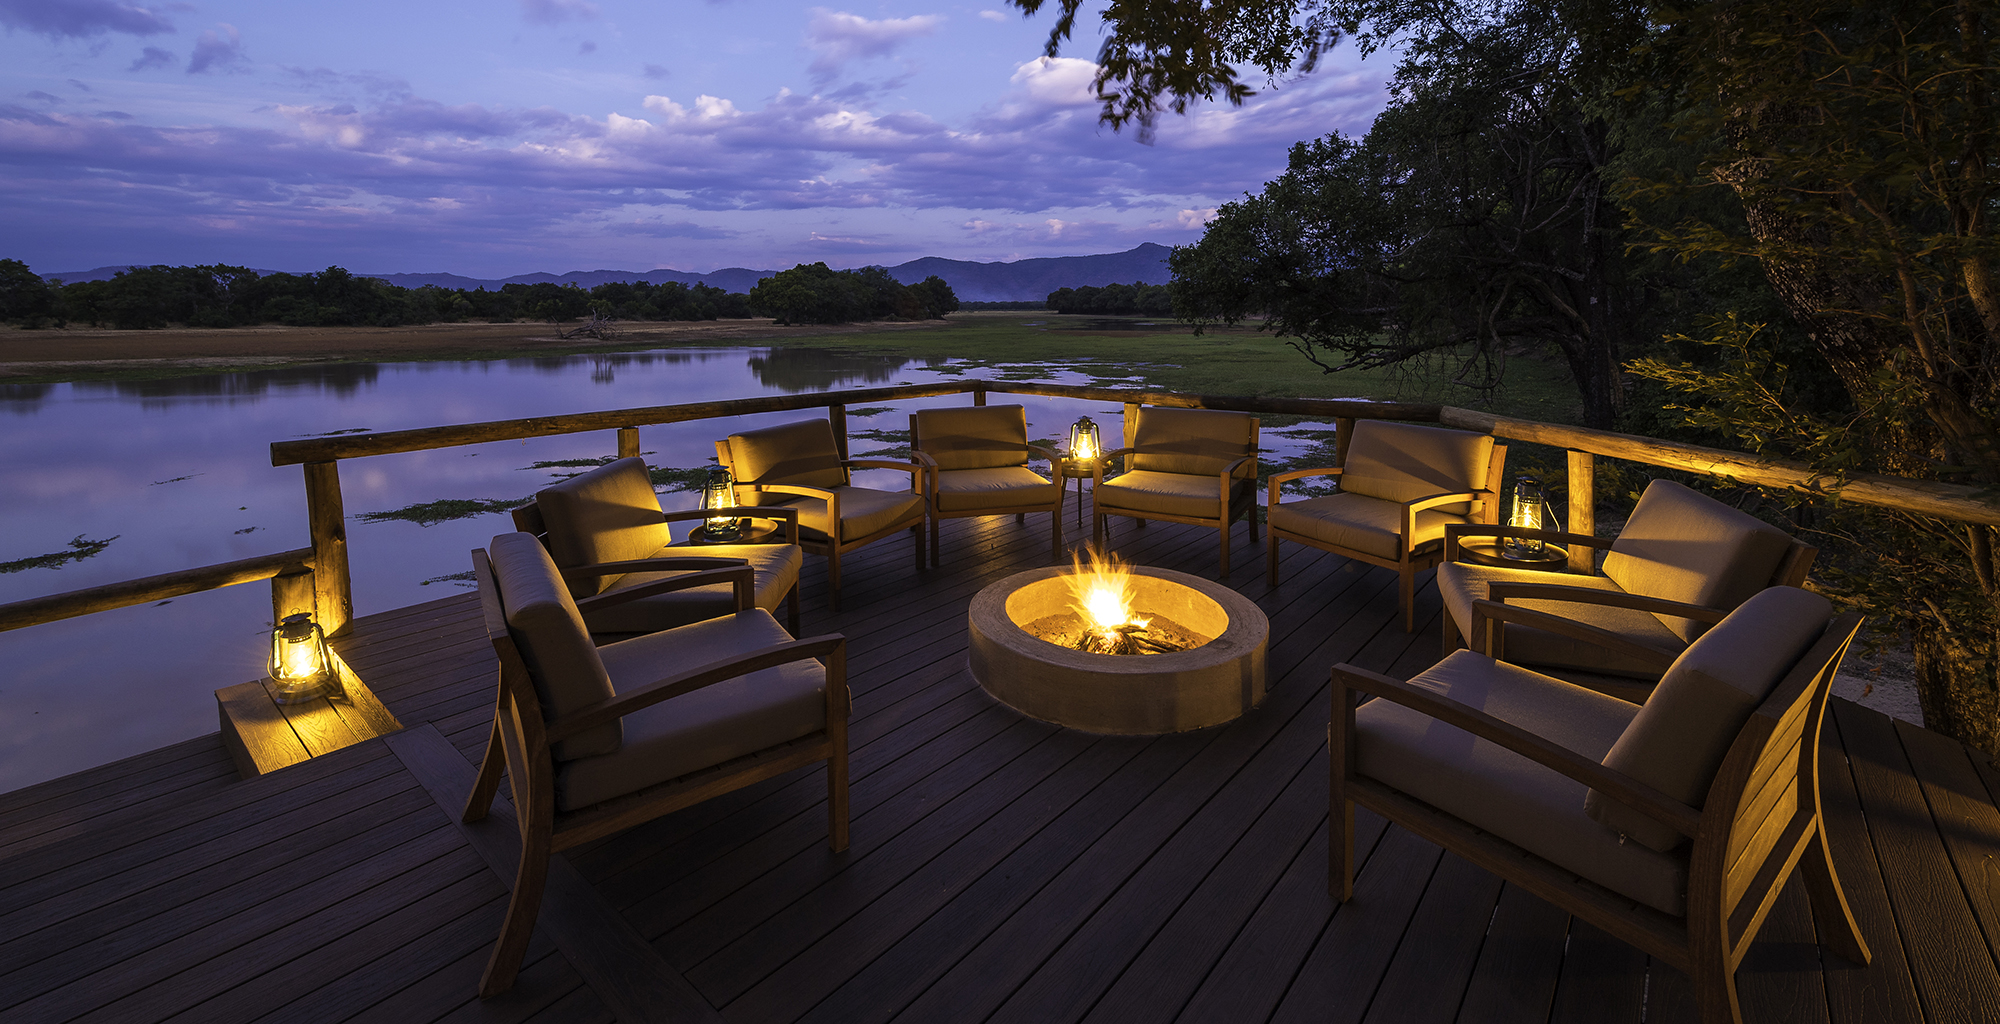 Zambia-Chindeni-Camp-Deck-Fire